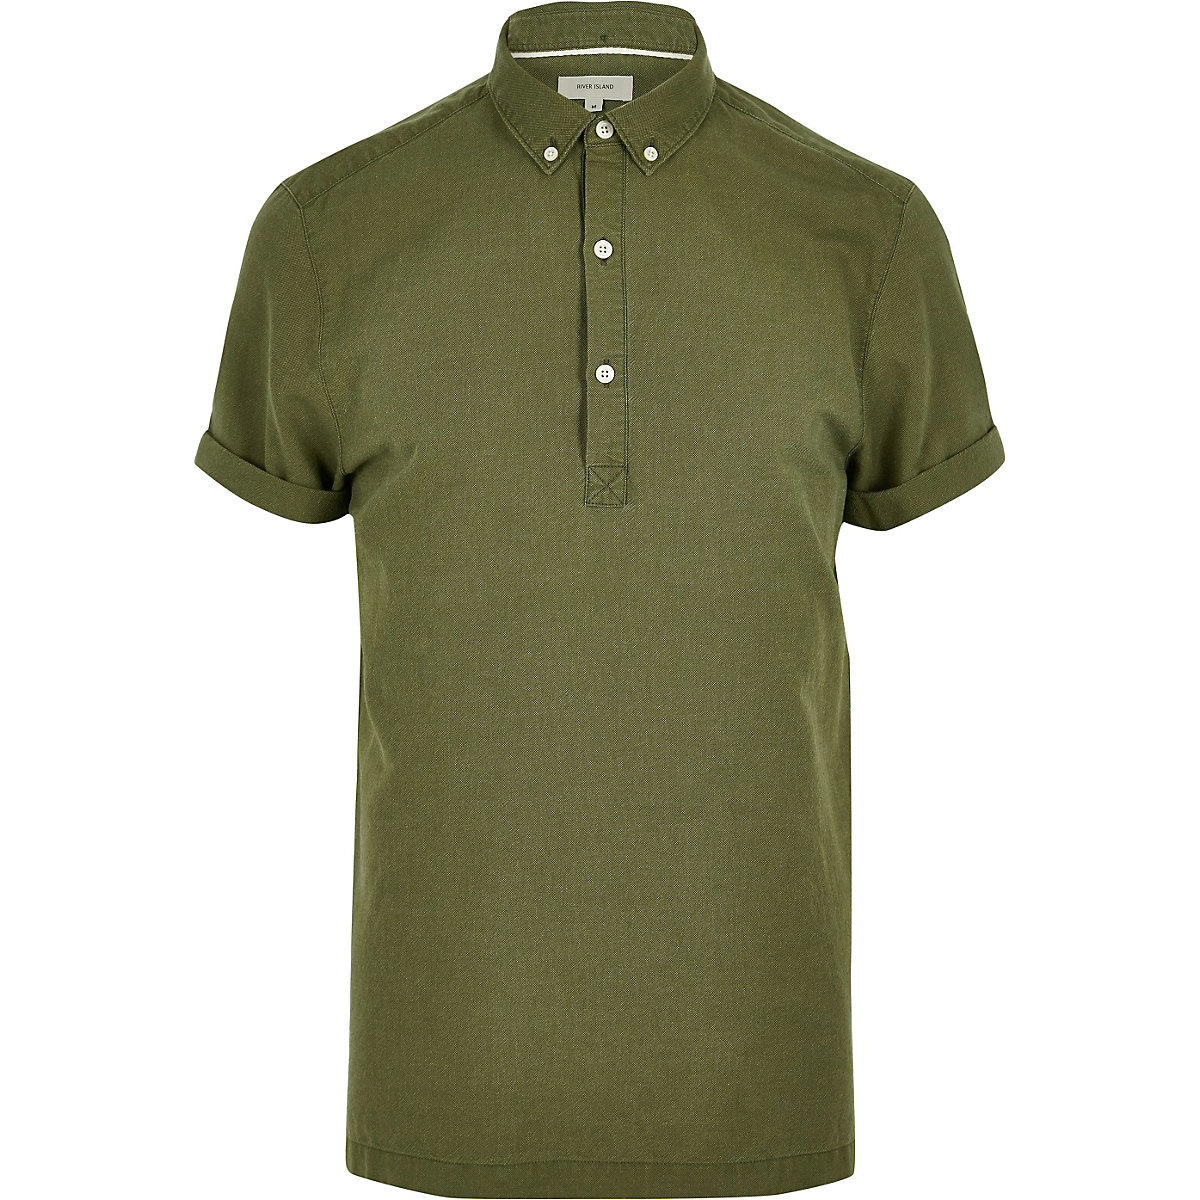 Green Polo Shirt Polo Shirts Sale Men